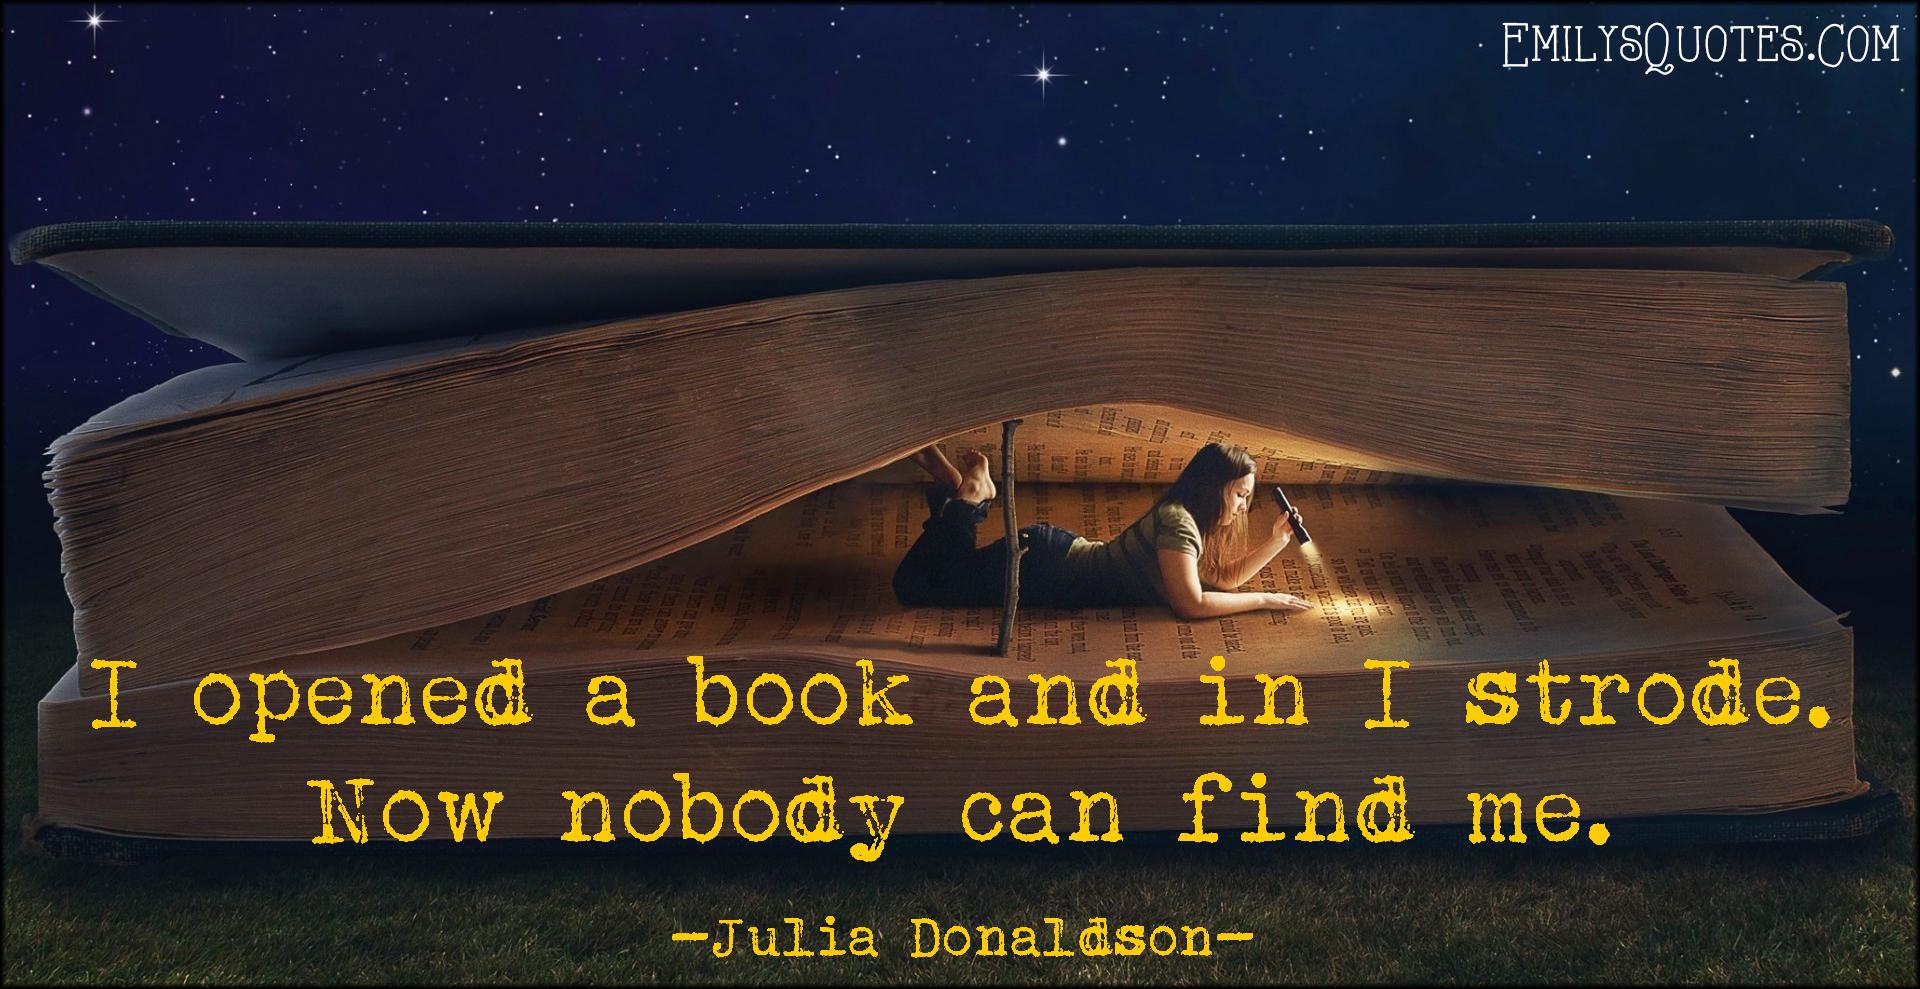 EmilysQuotes.Com - open, book, strode, find, imagination, dream, inspirational, reading, Julia Donaldson